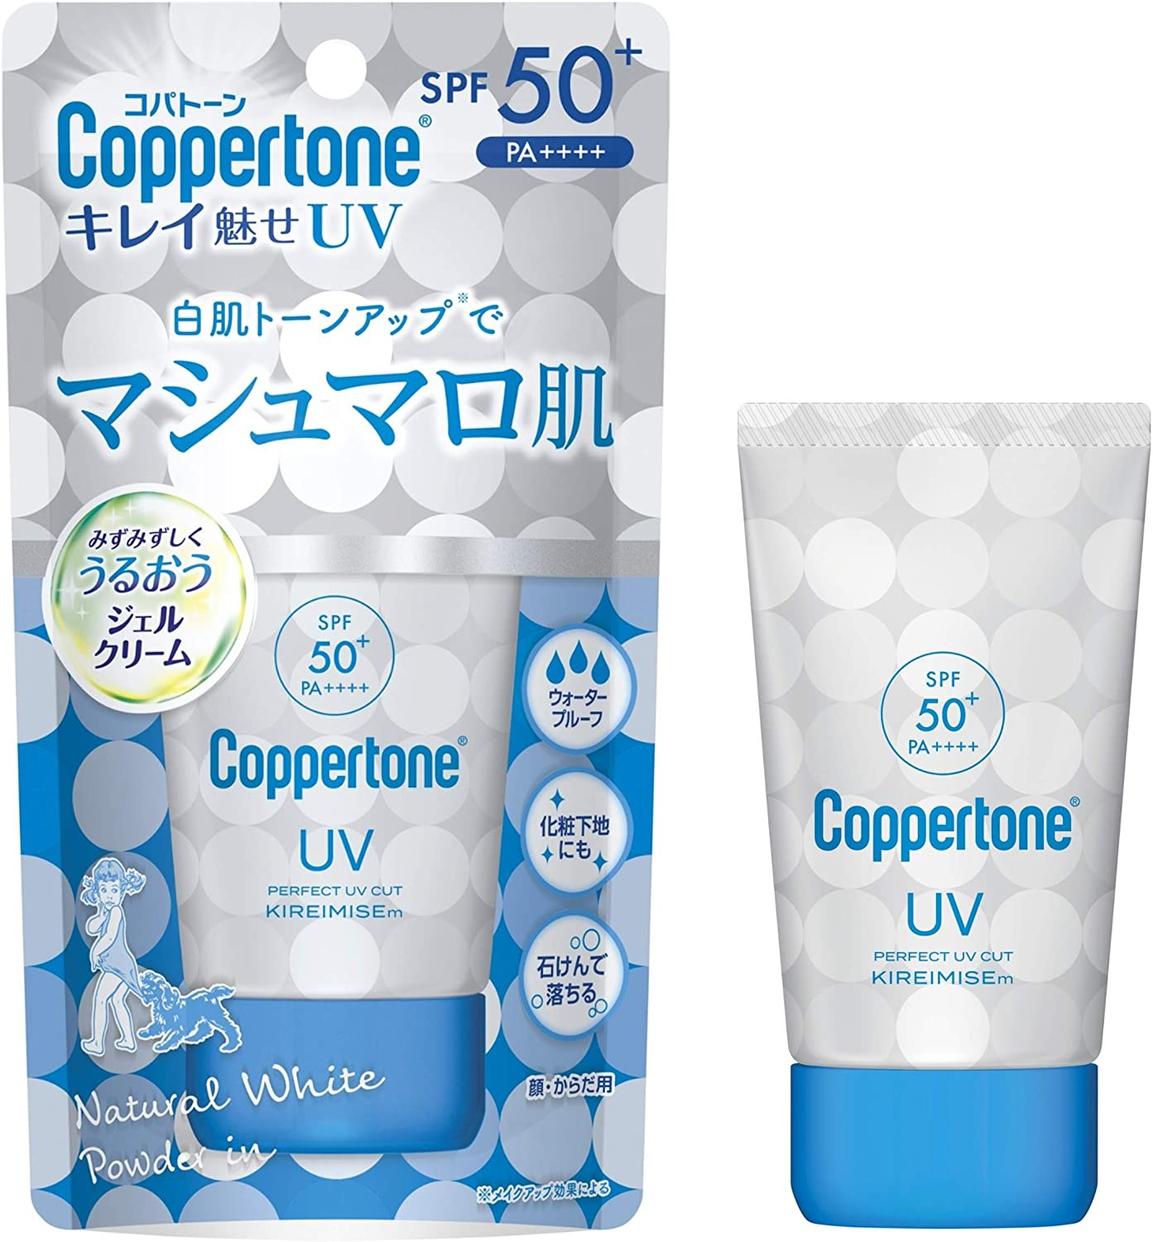 Coppertone(コパトーン) キレイ魅せUV マシュマロ肌